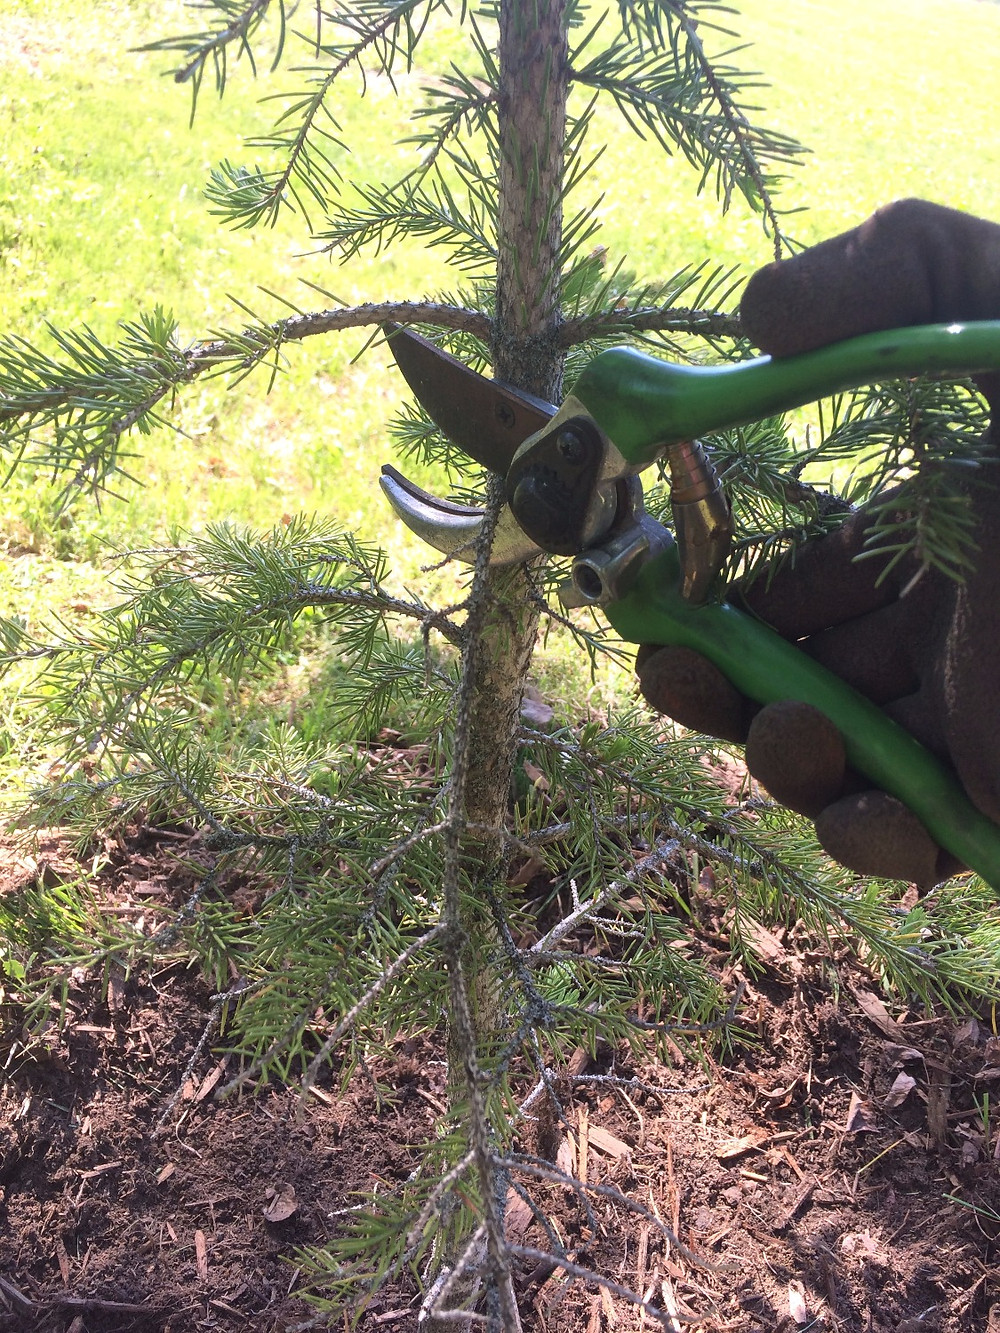 Pruning an evergreen tree